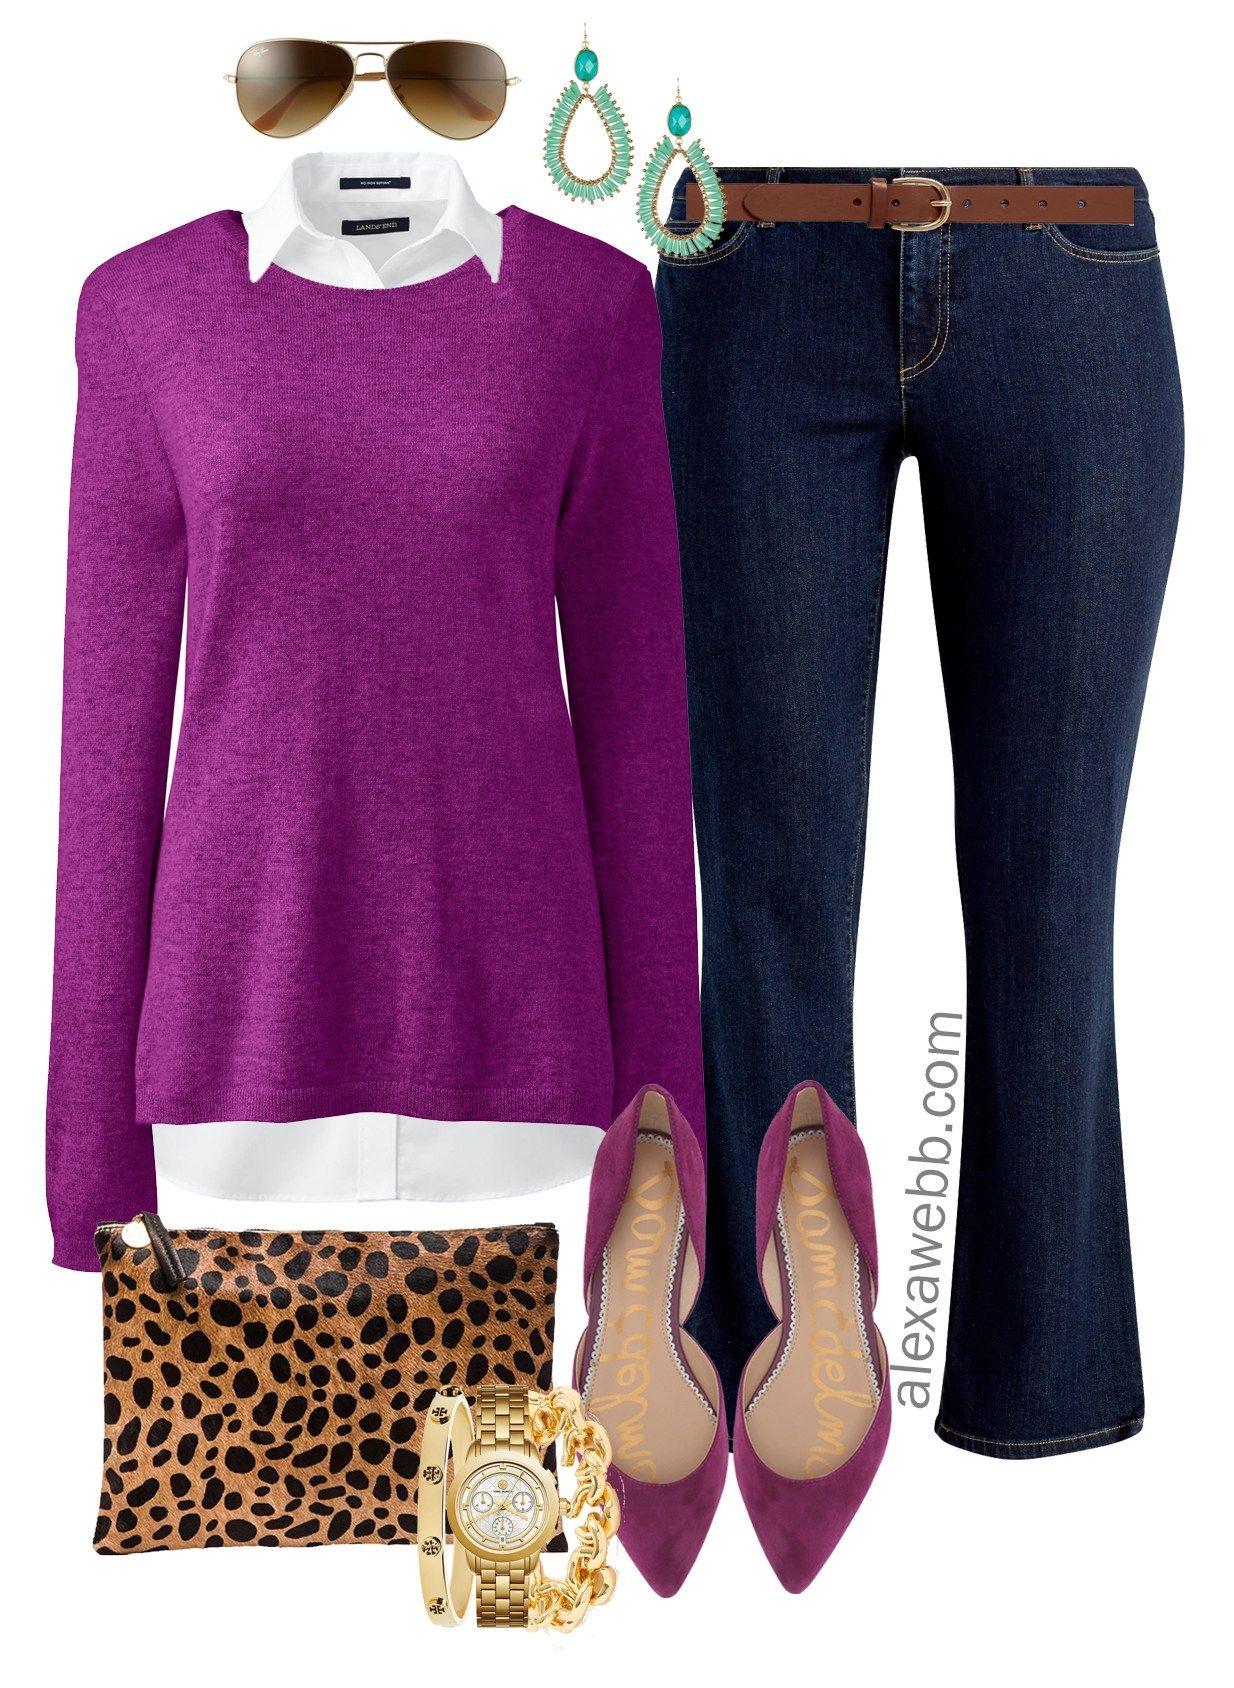 21241b5b94 Plus Size Bright Sweater Outfit Ideas - Plus Size Purple Sweater Outfit -  Plus Size Fall and Winter Outfits - Plus Size Fashion for Women -  alexawebb.com ...